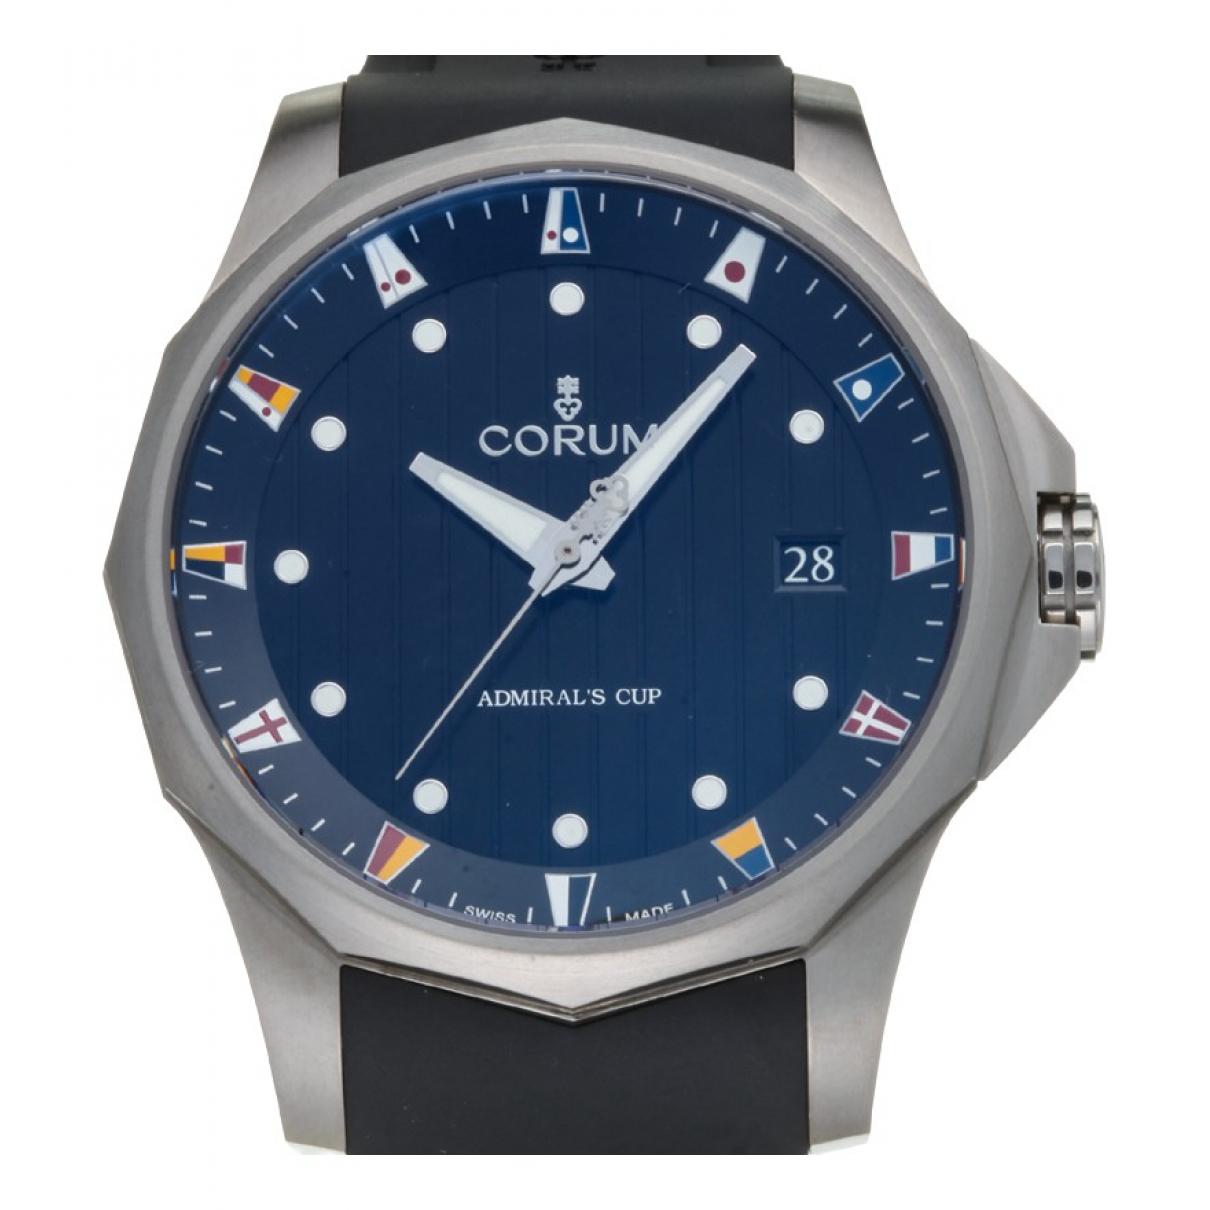 Relojes Admirals Cup Corum